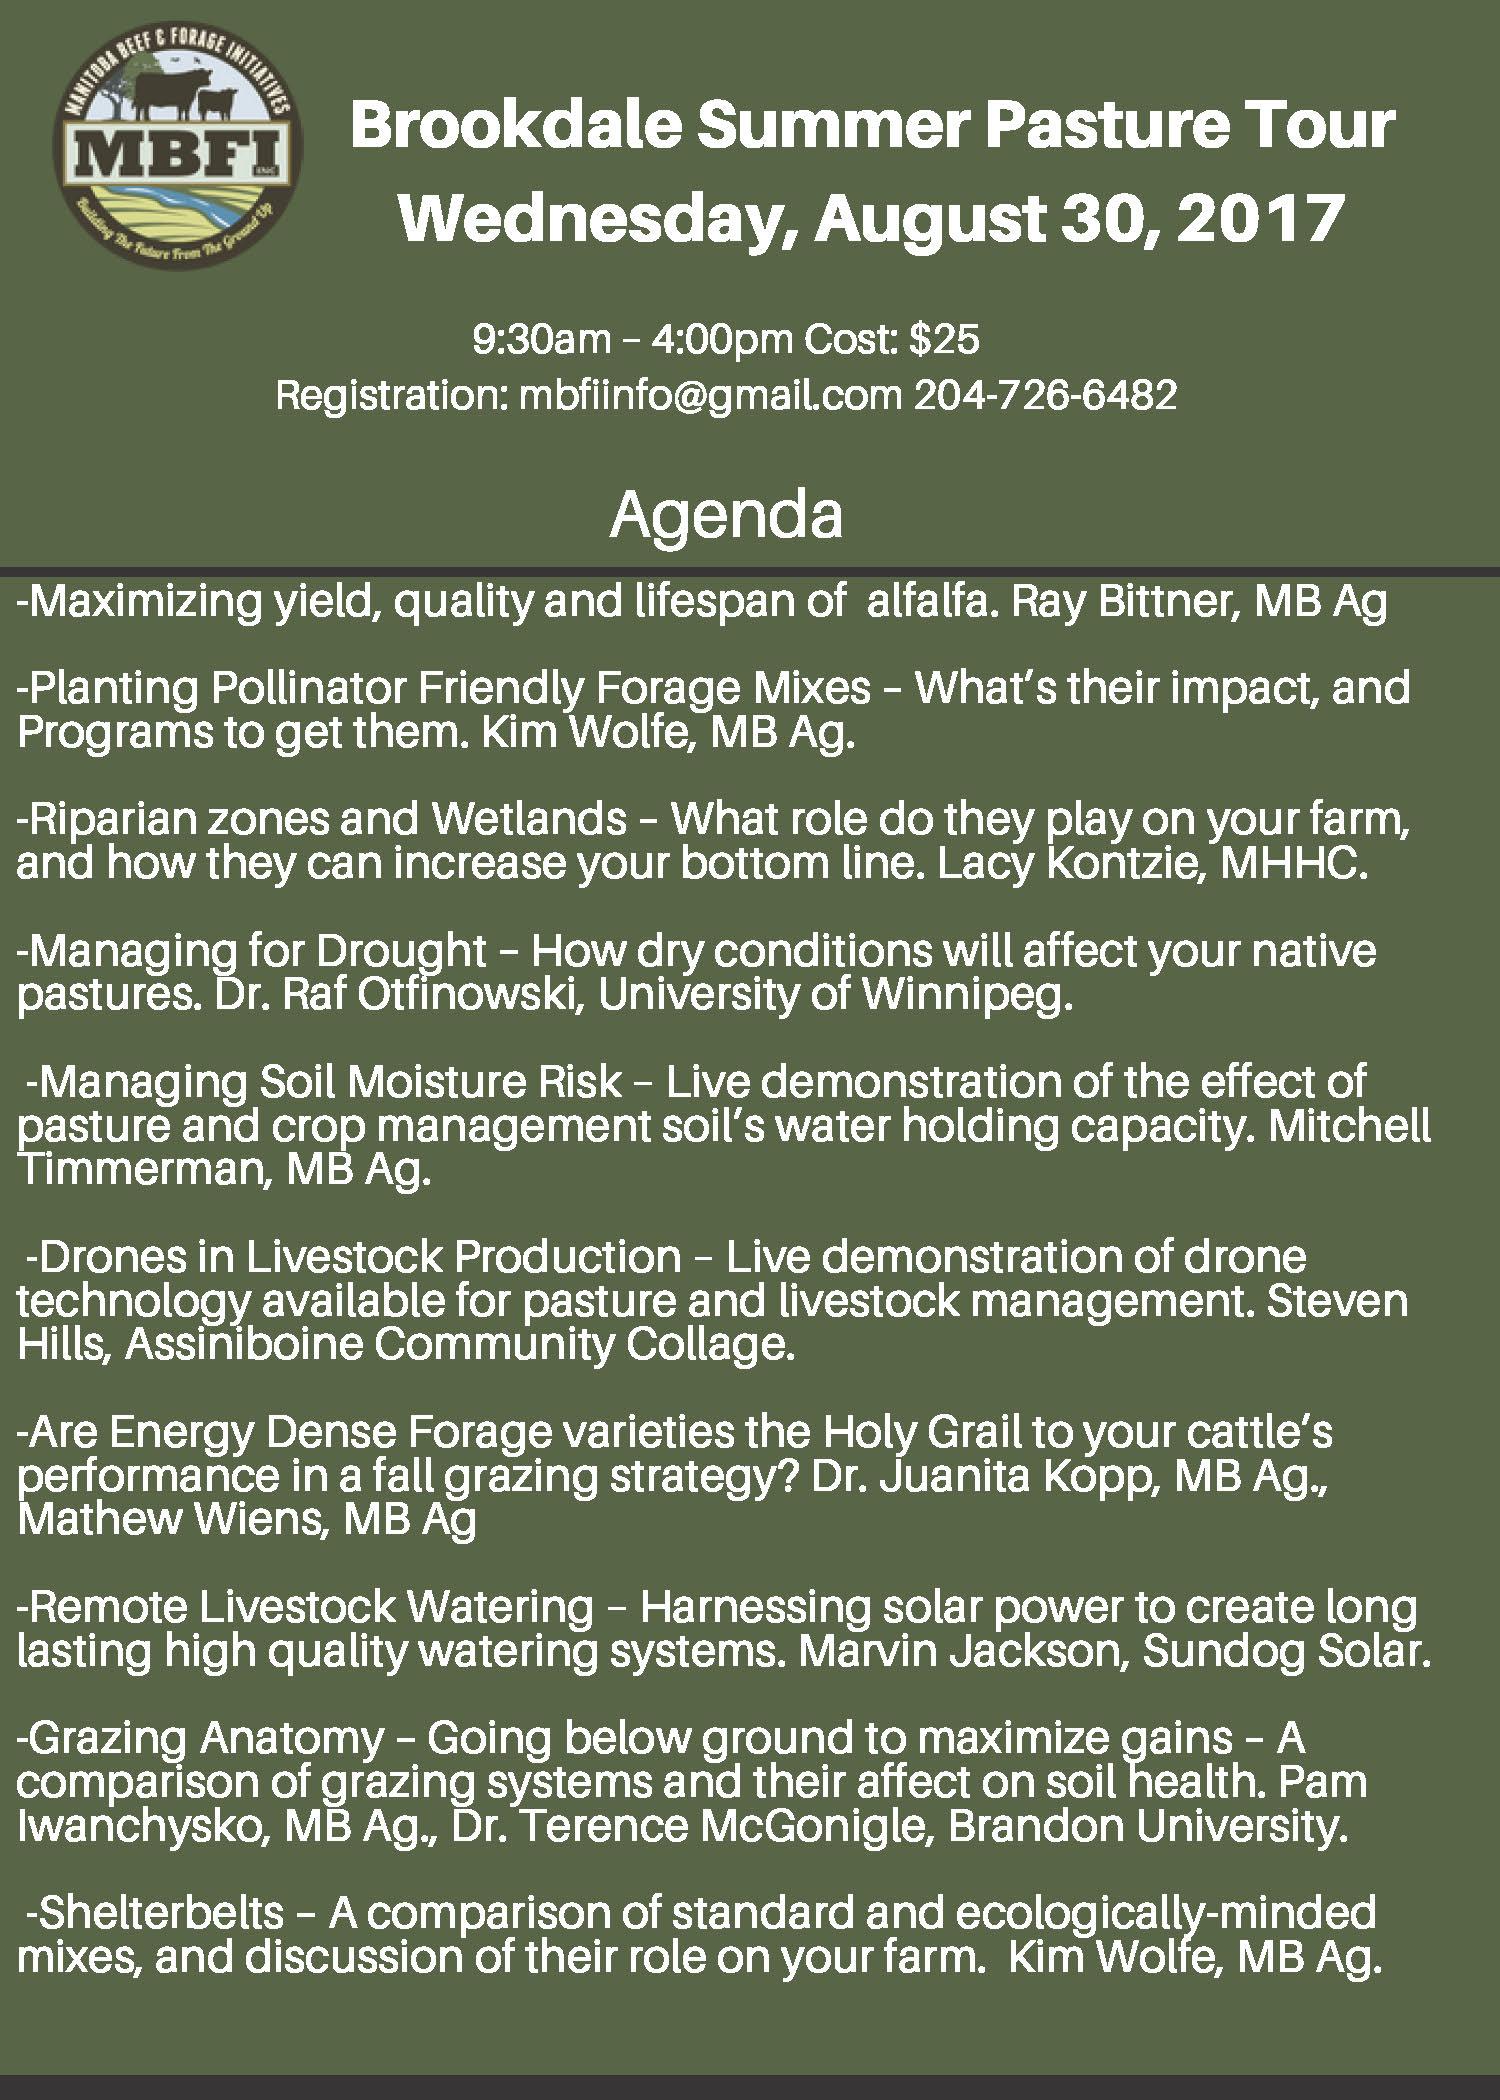 Brookdale Summer Pasture Agenda 8.jpg